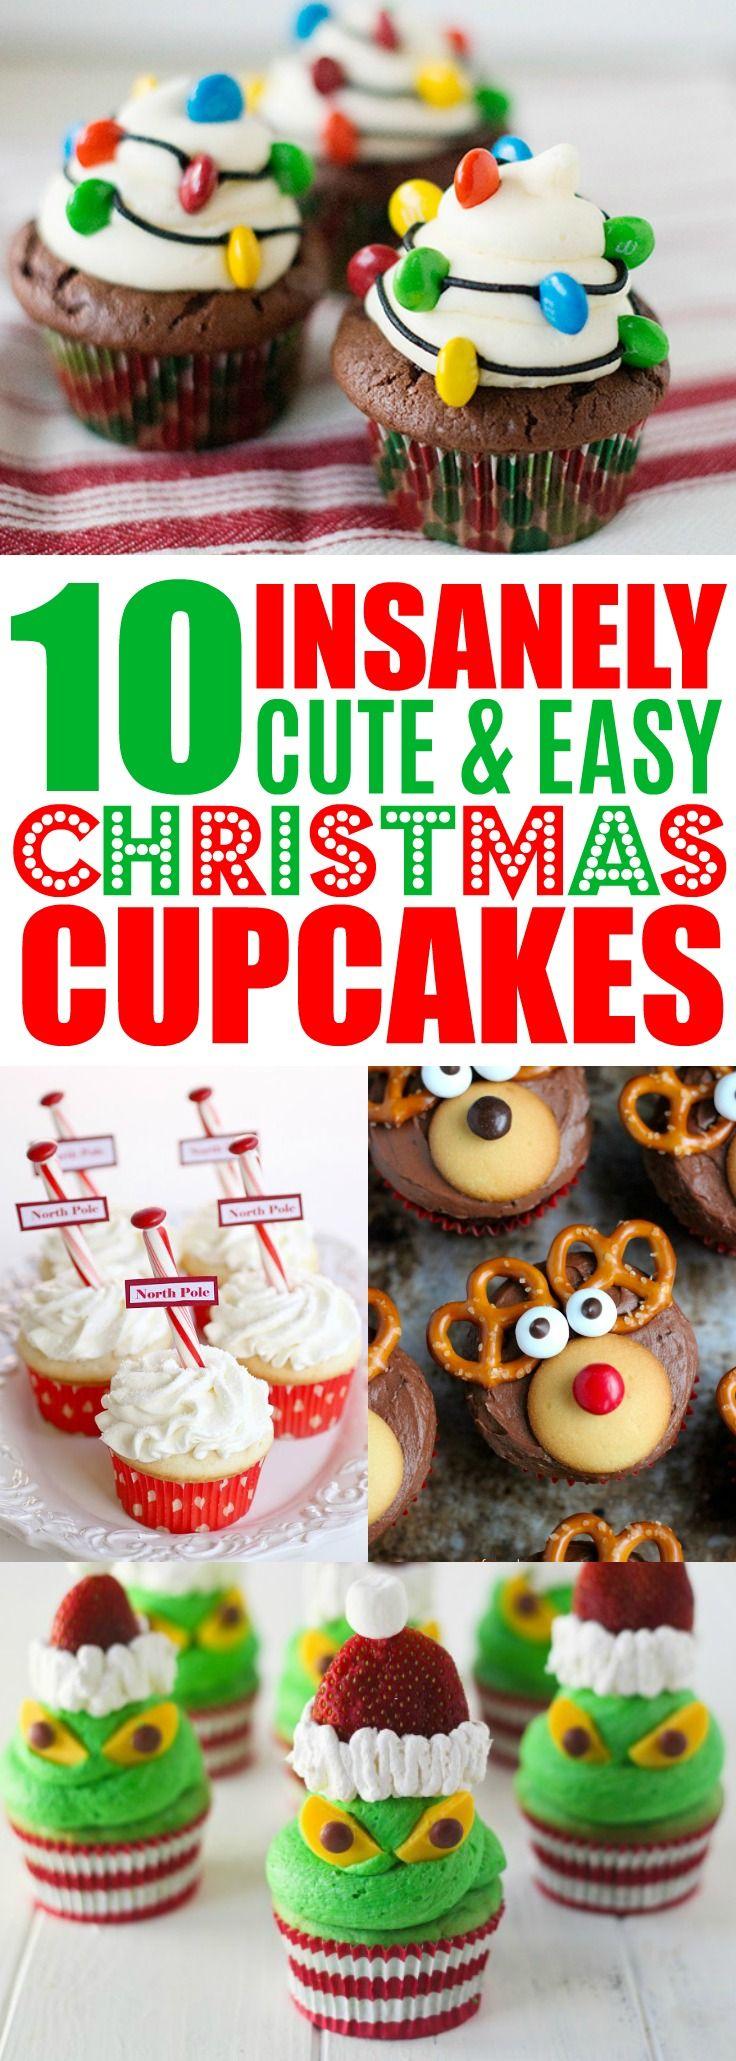 Easy Christmas Cupcakes For Kids.Fun Kid Approved Christmas Cupcake Ideas Christmas Recipes